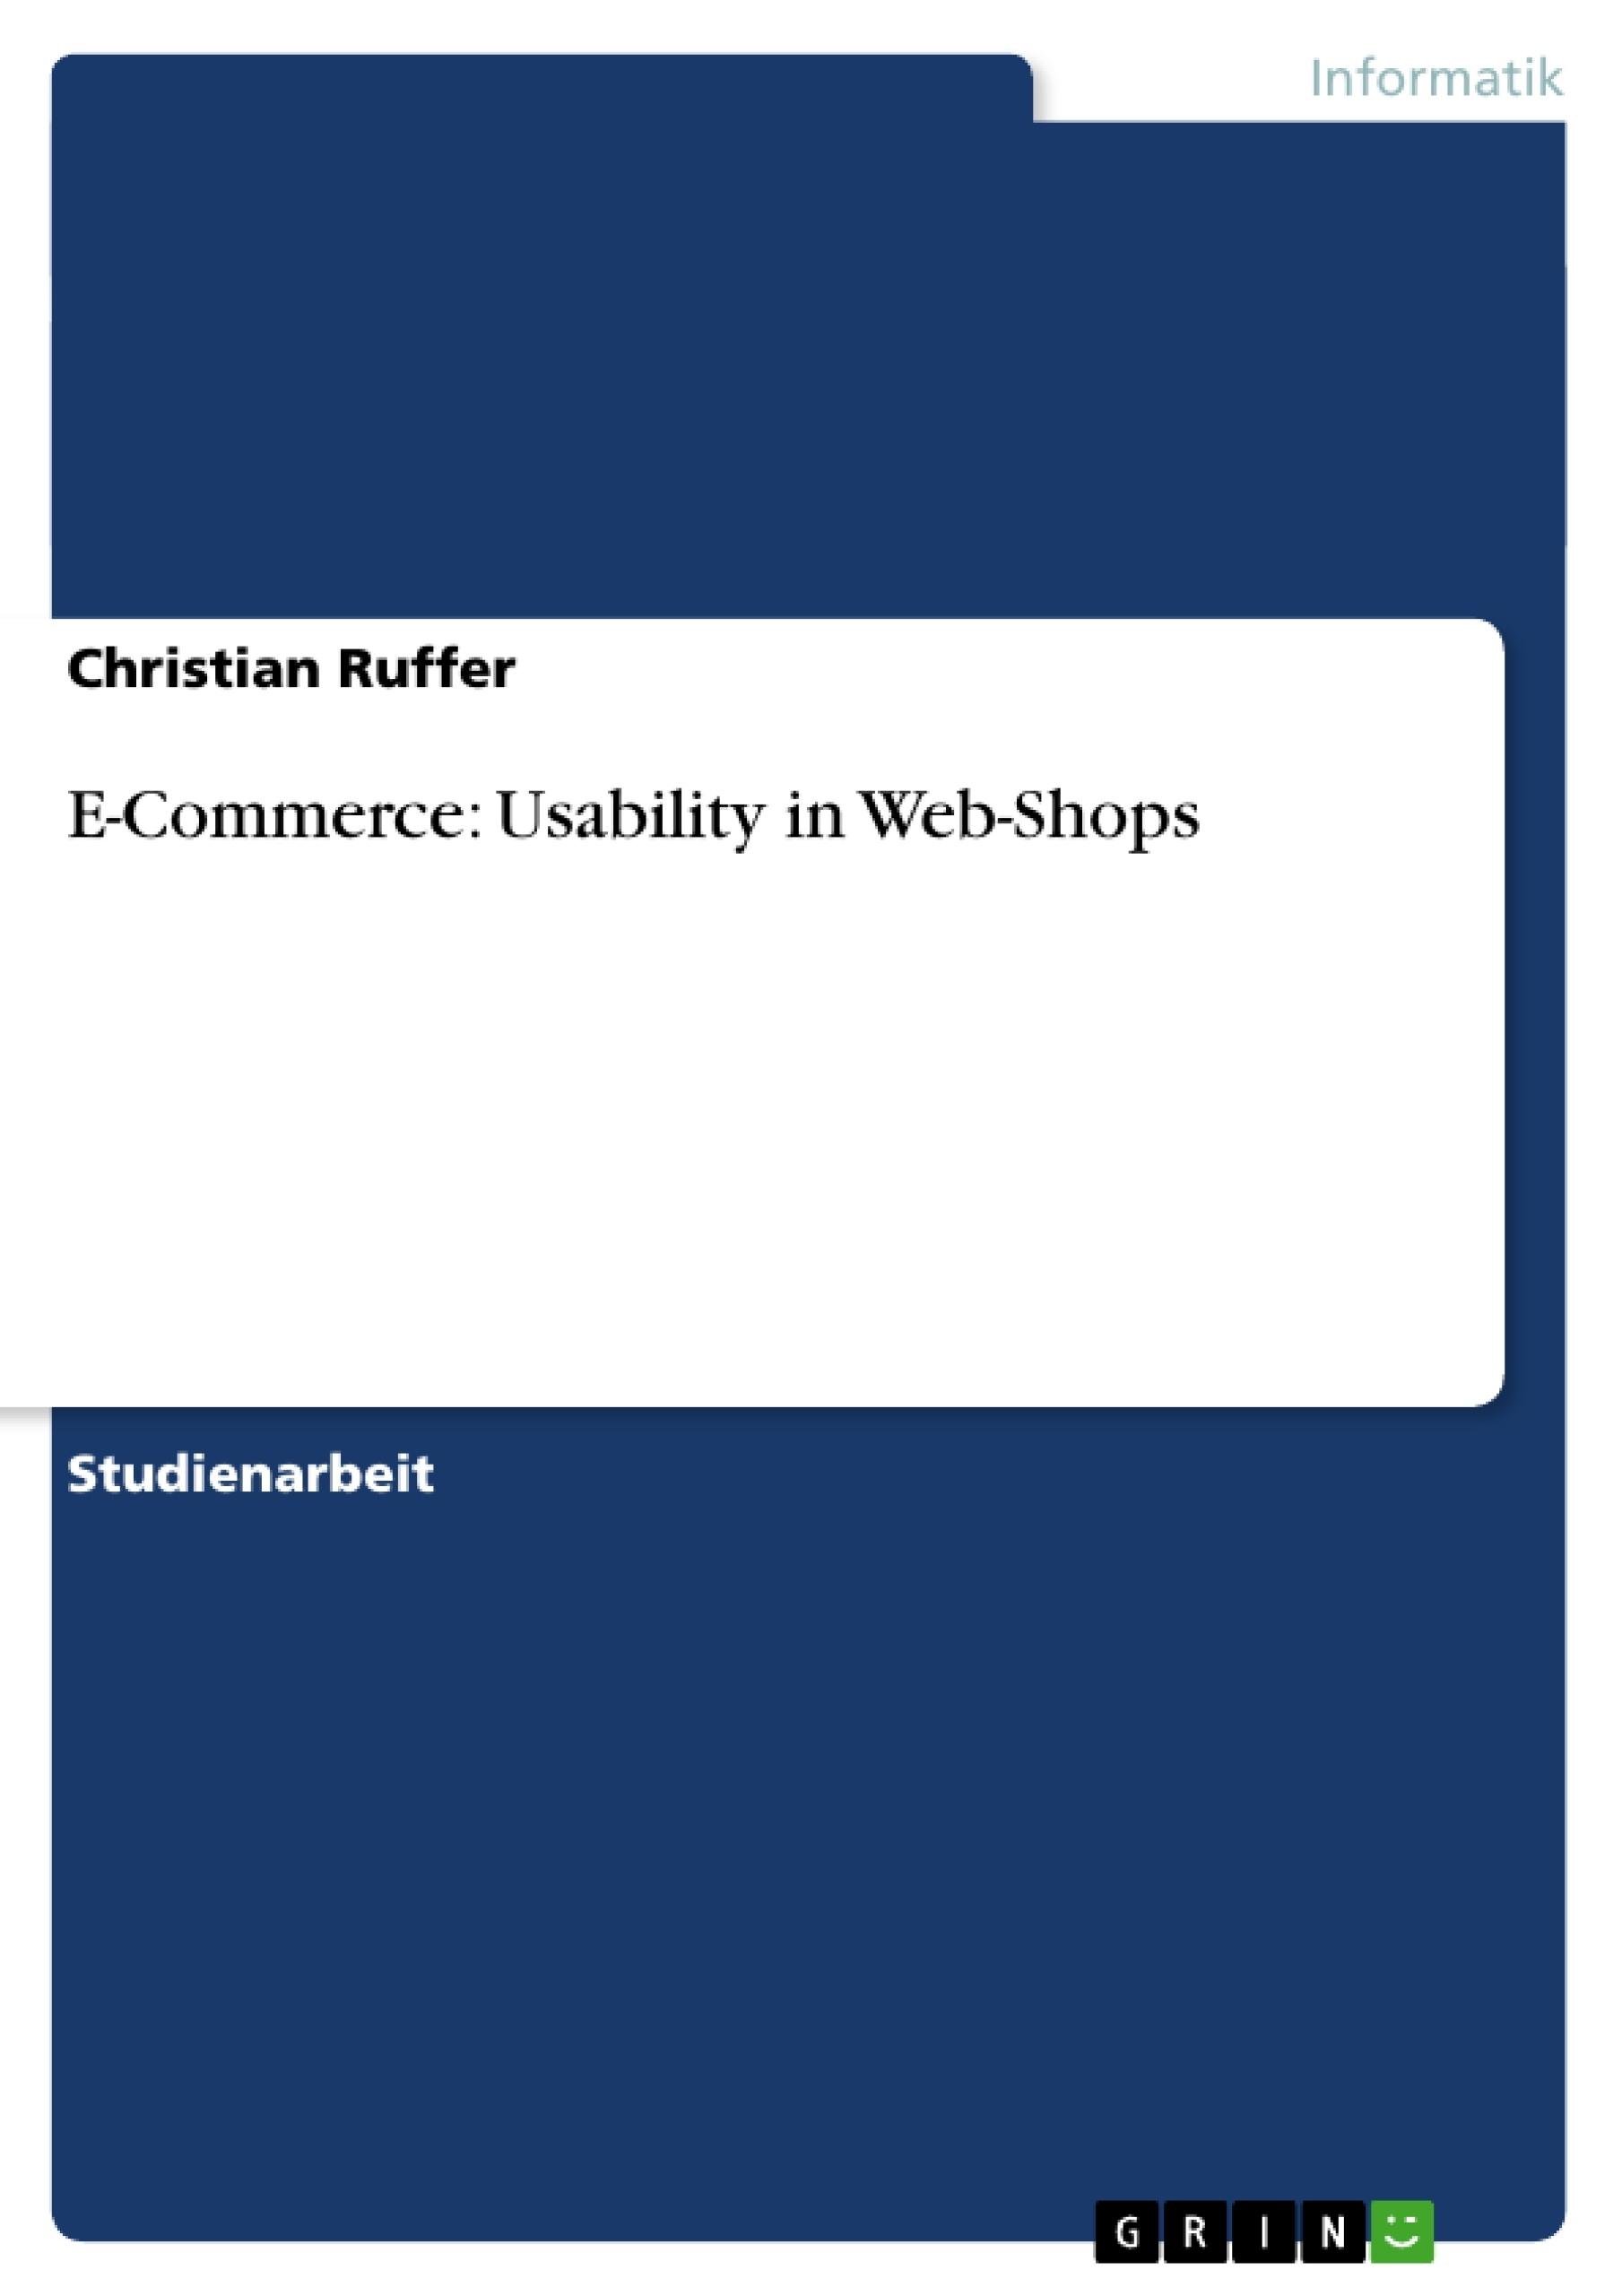 Titel: E-Commerce: Usability in Web-Shops